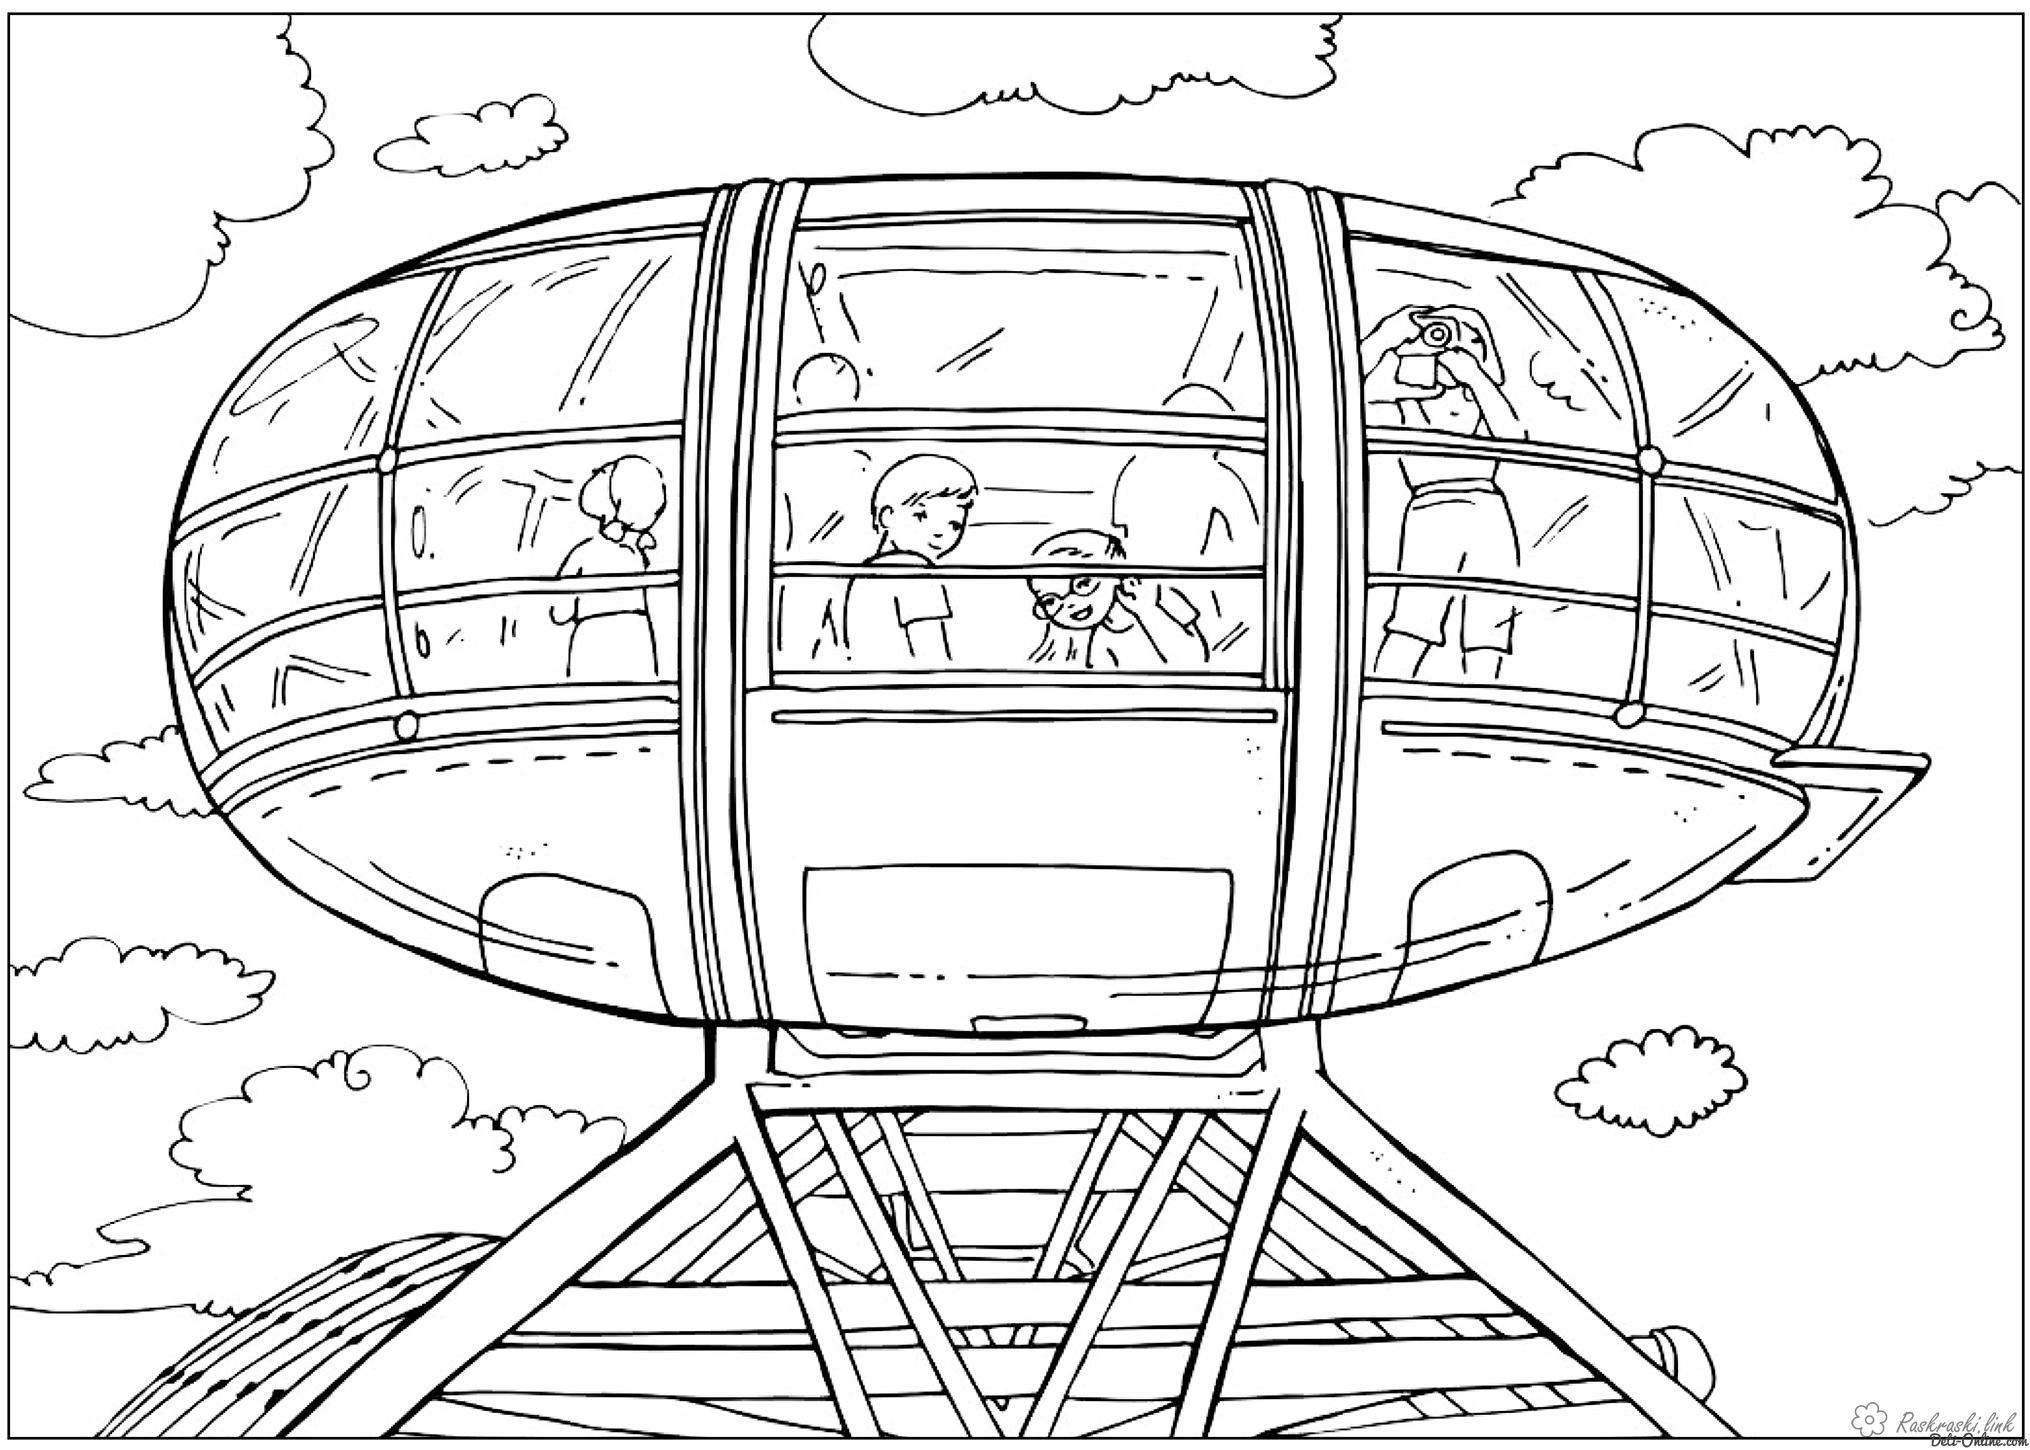 Coloring London coloring pages London Eye - Ferris Wheel UK